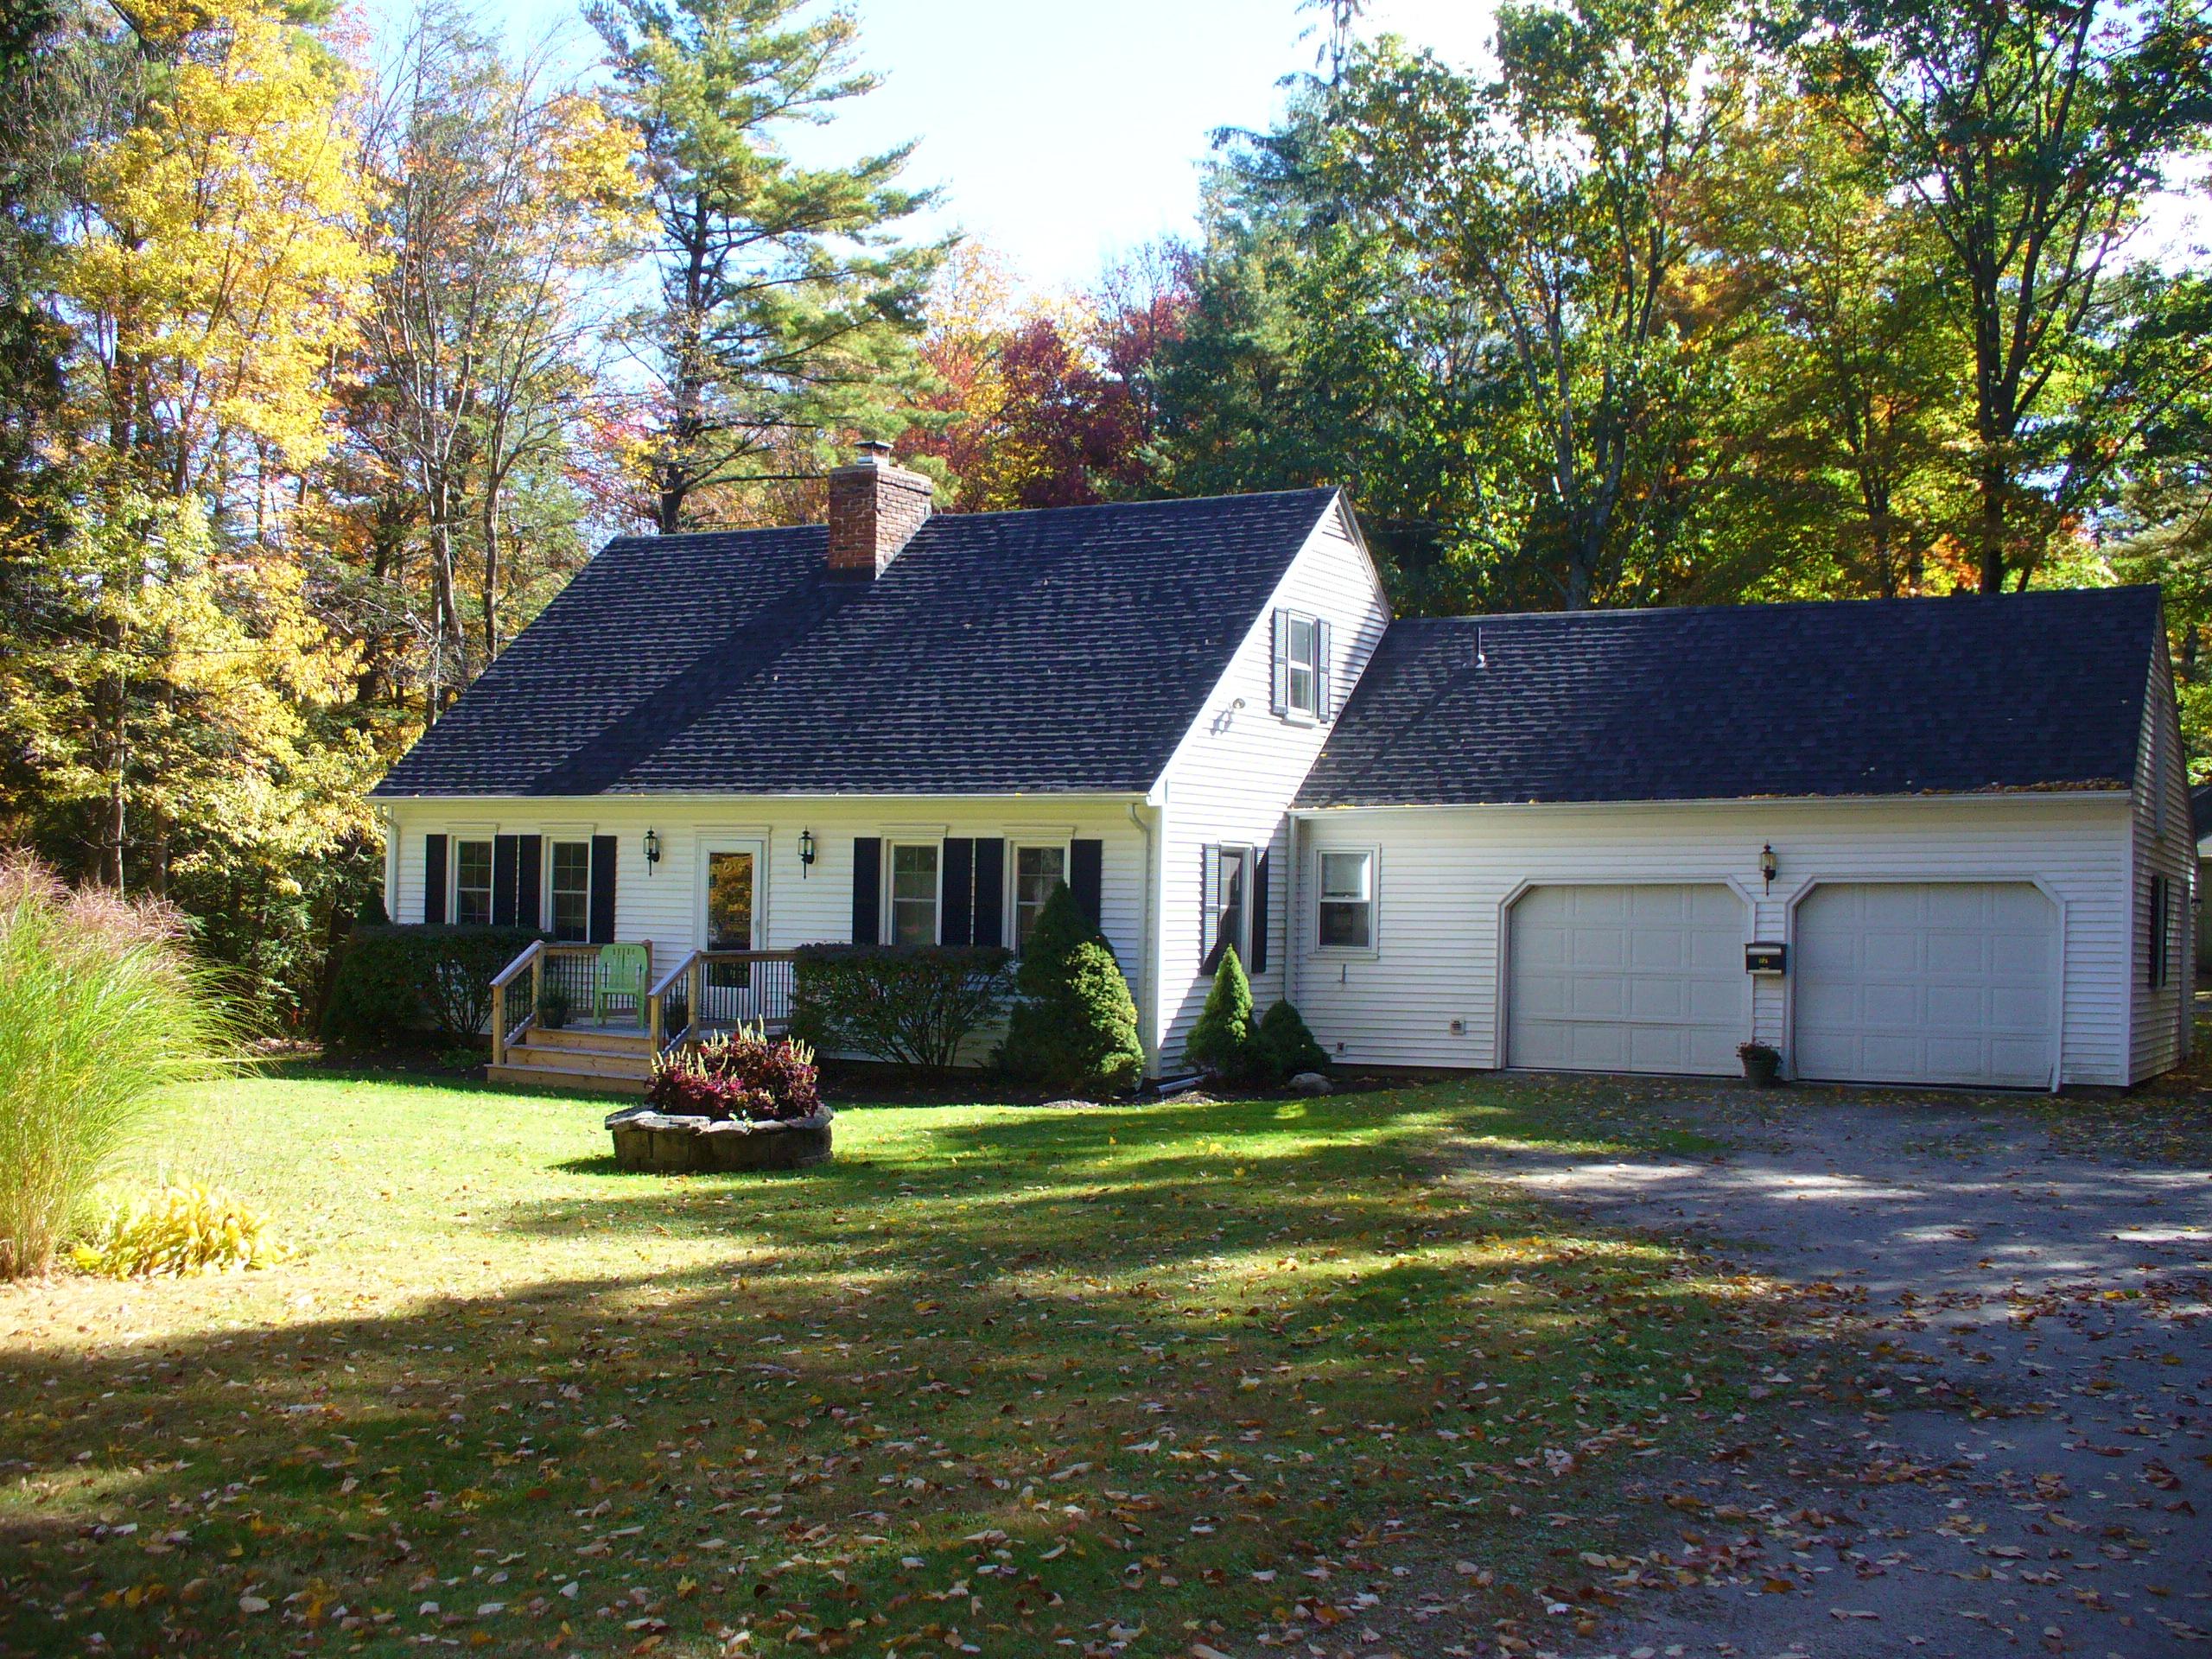 Moradia para Venda às Updated Goshen Cape on 4 Acres. 287 Sharon Tpke Goshen, Connecticut, 06756 Estados Unidos